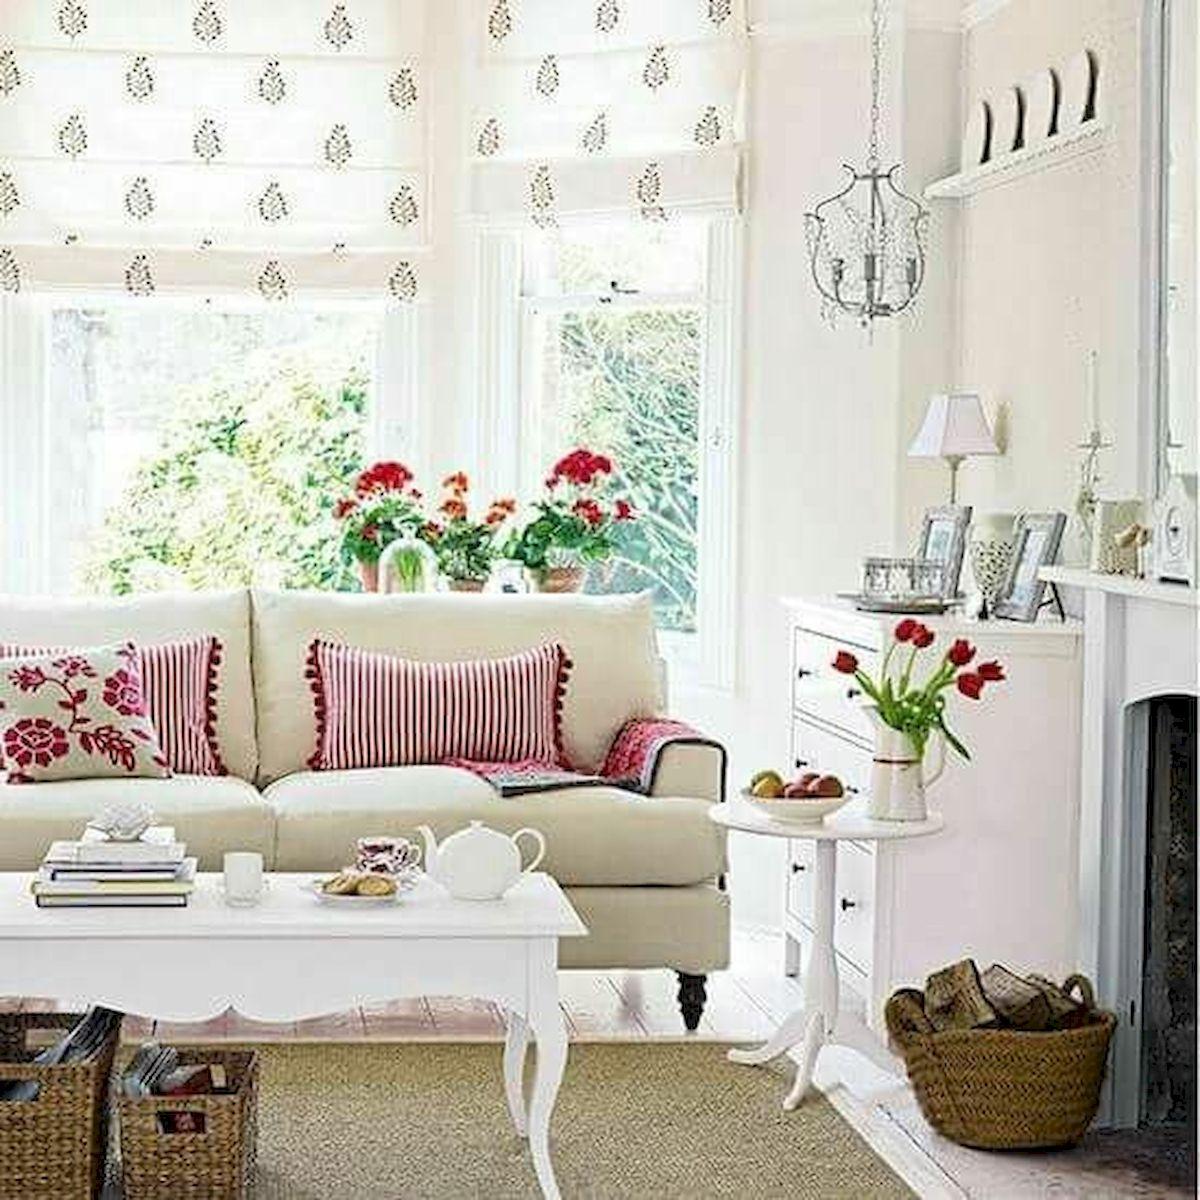 45 Colorful Interior Home Design and Decor Ideas (31)